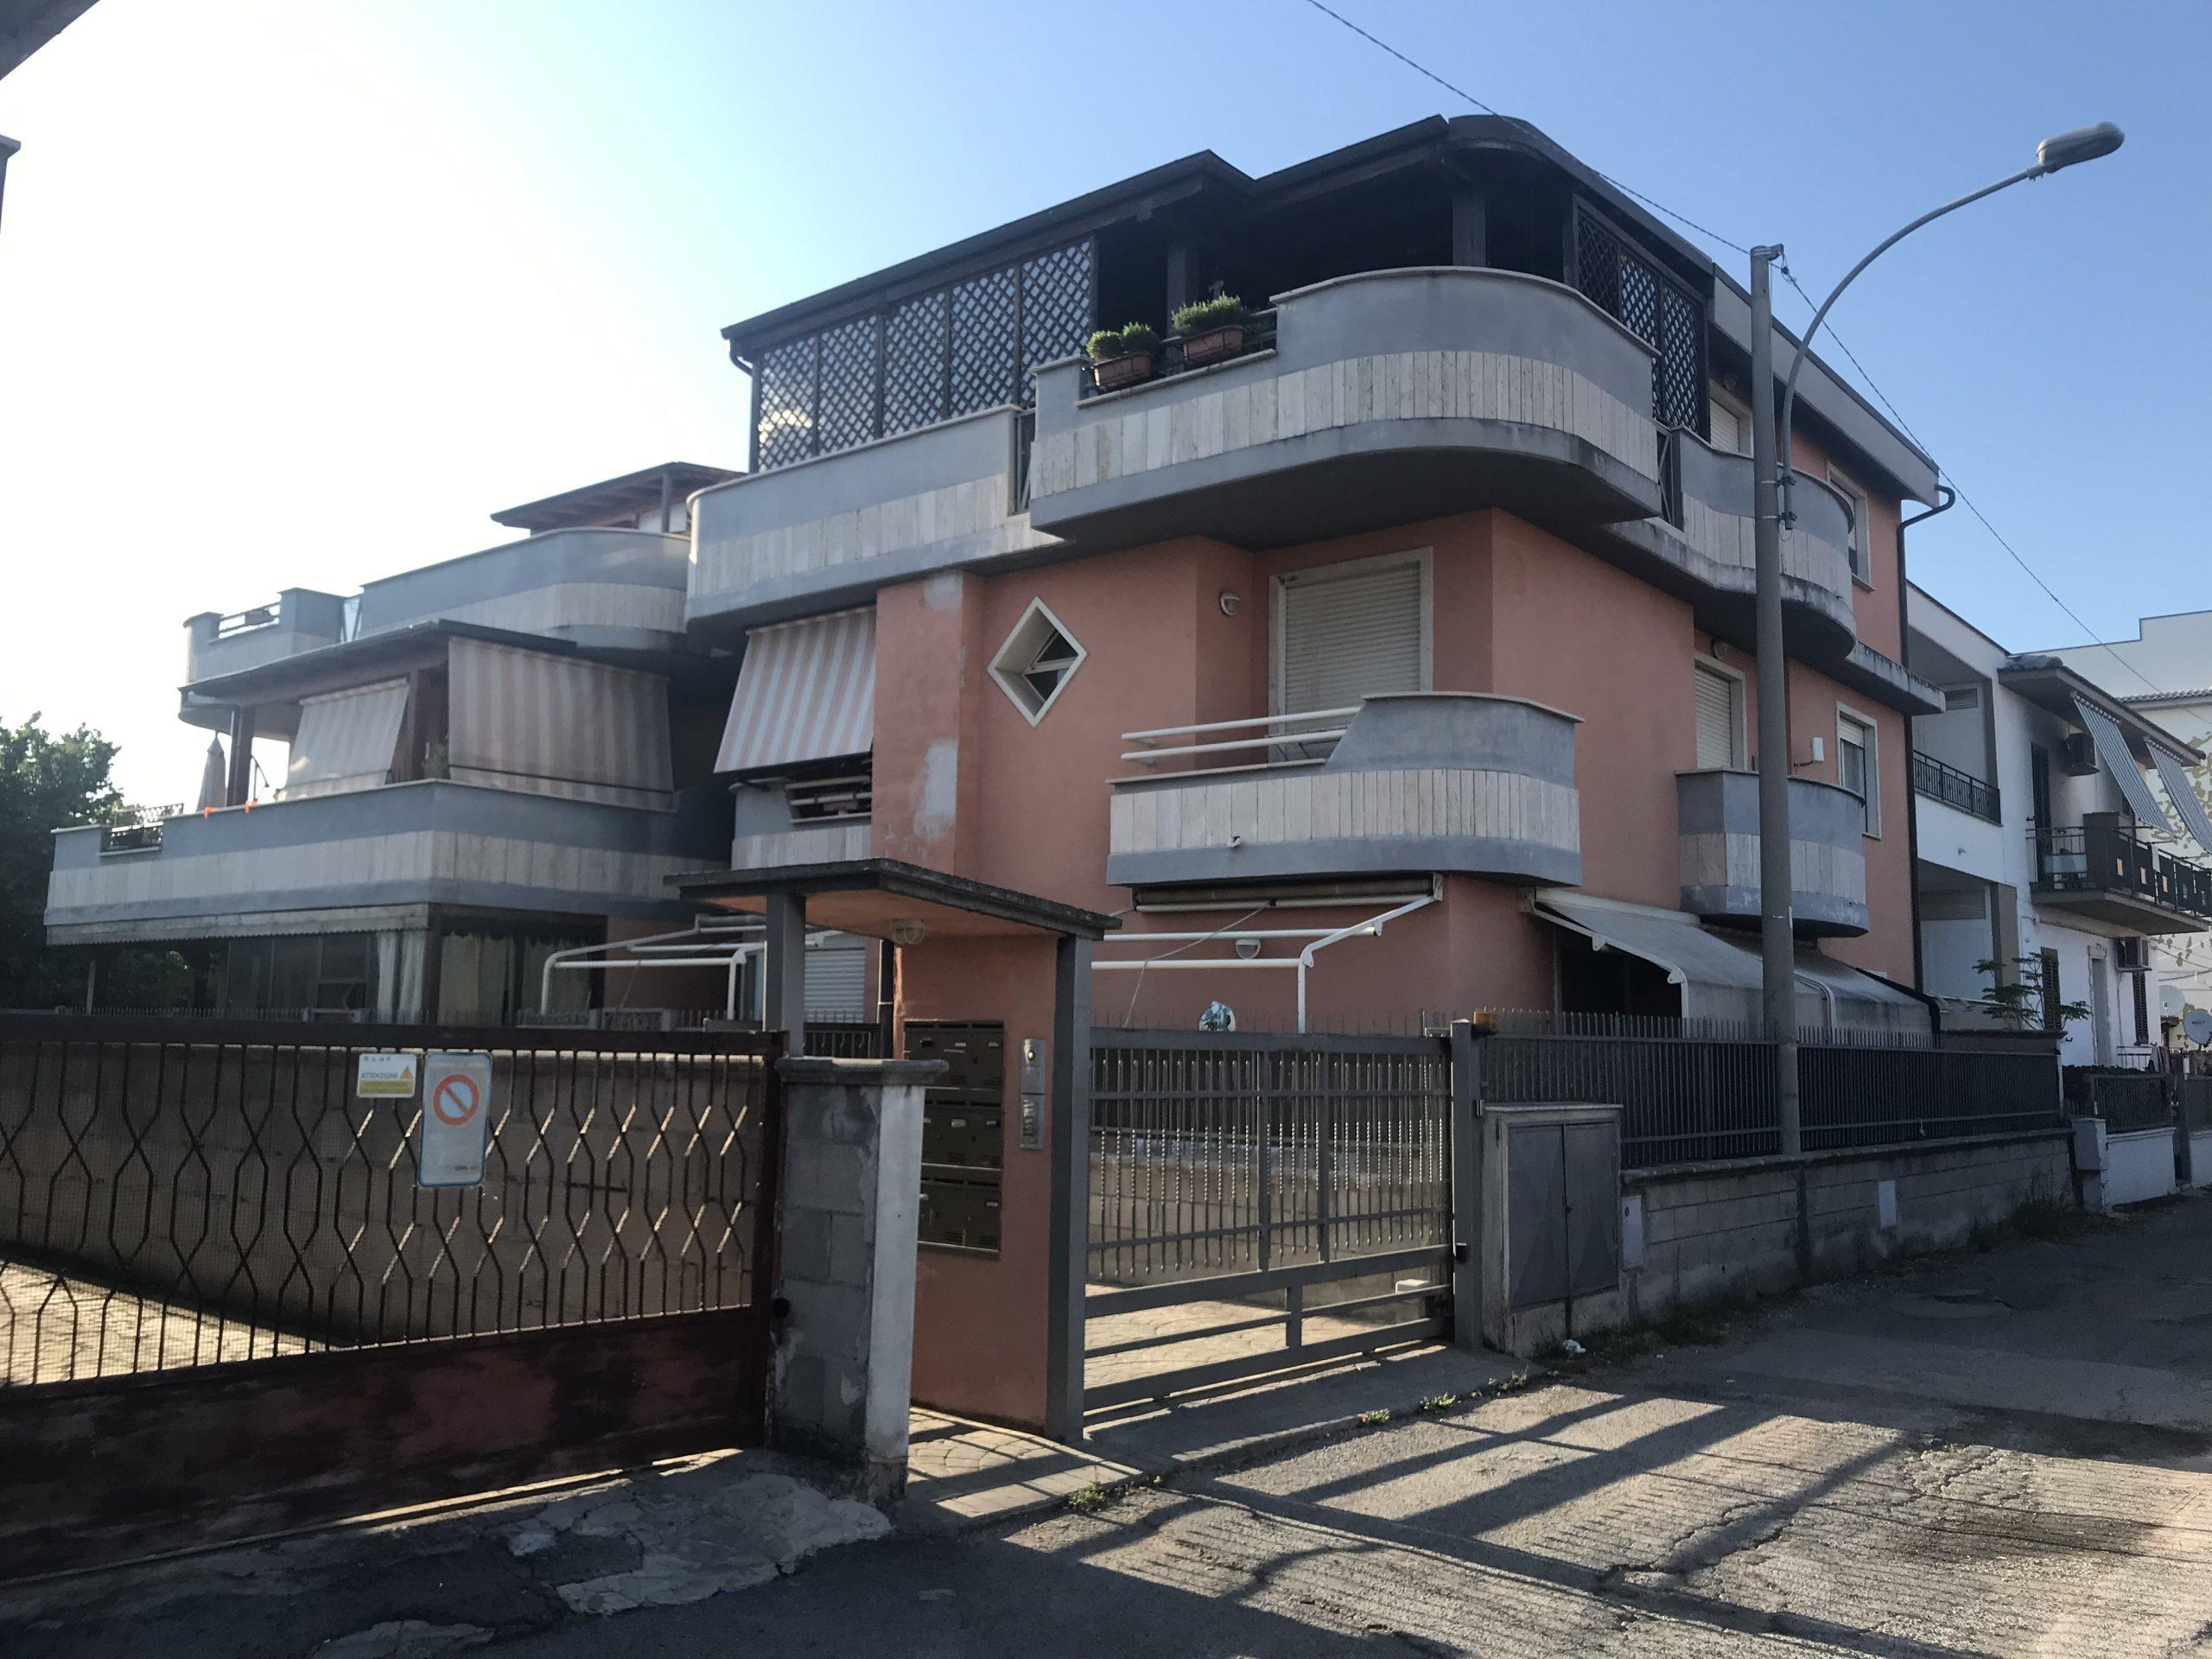 Affittiamo Appartamento Arredato a Latina Scalo